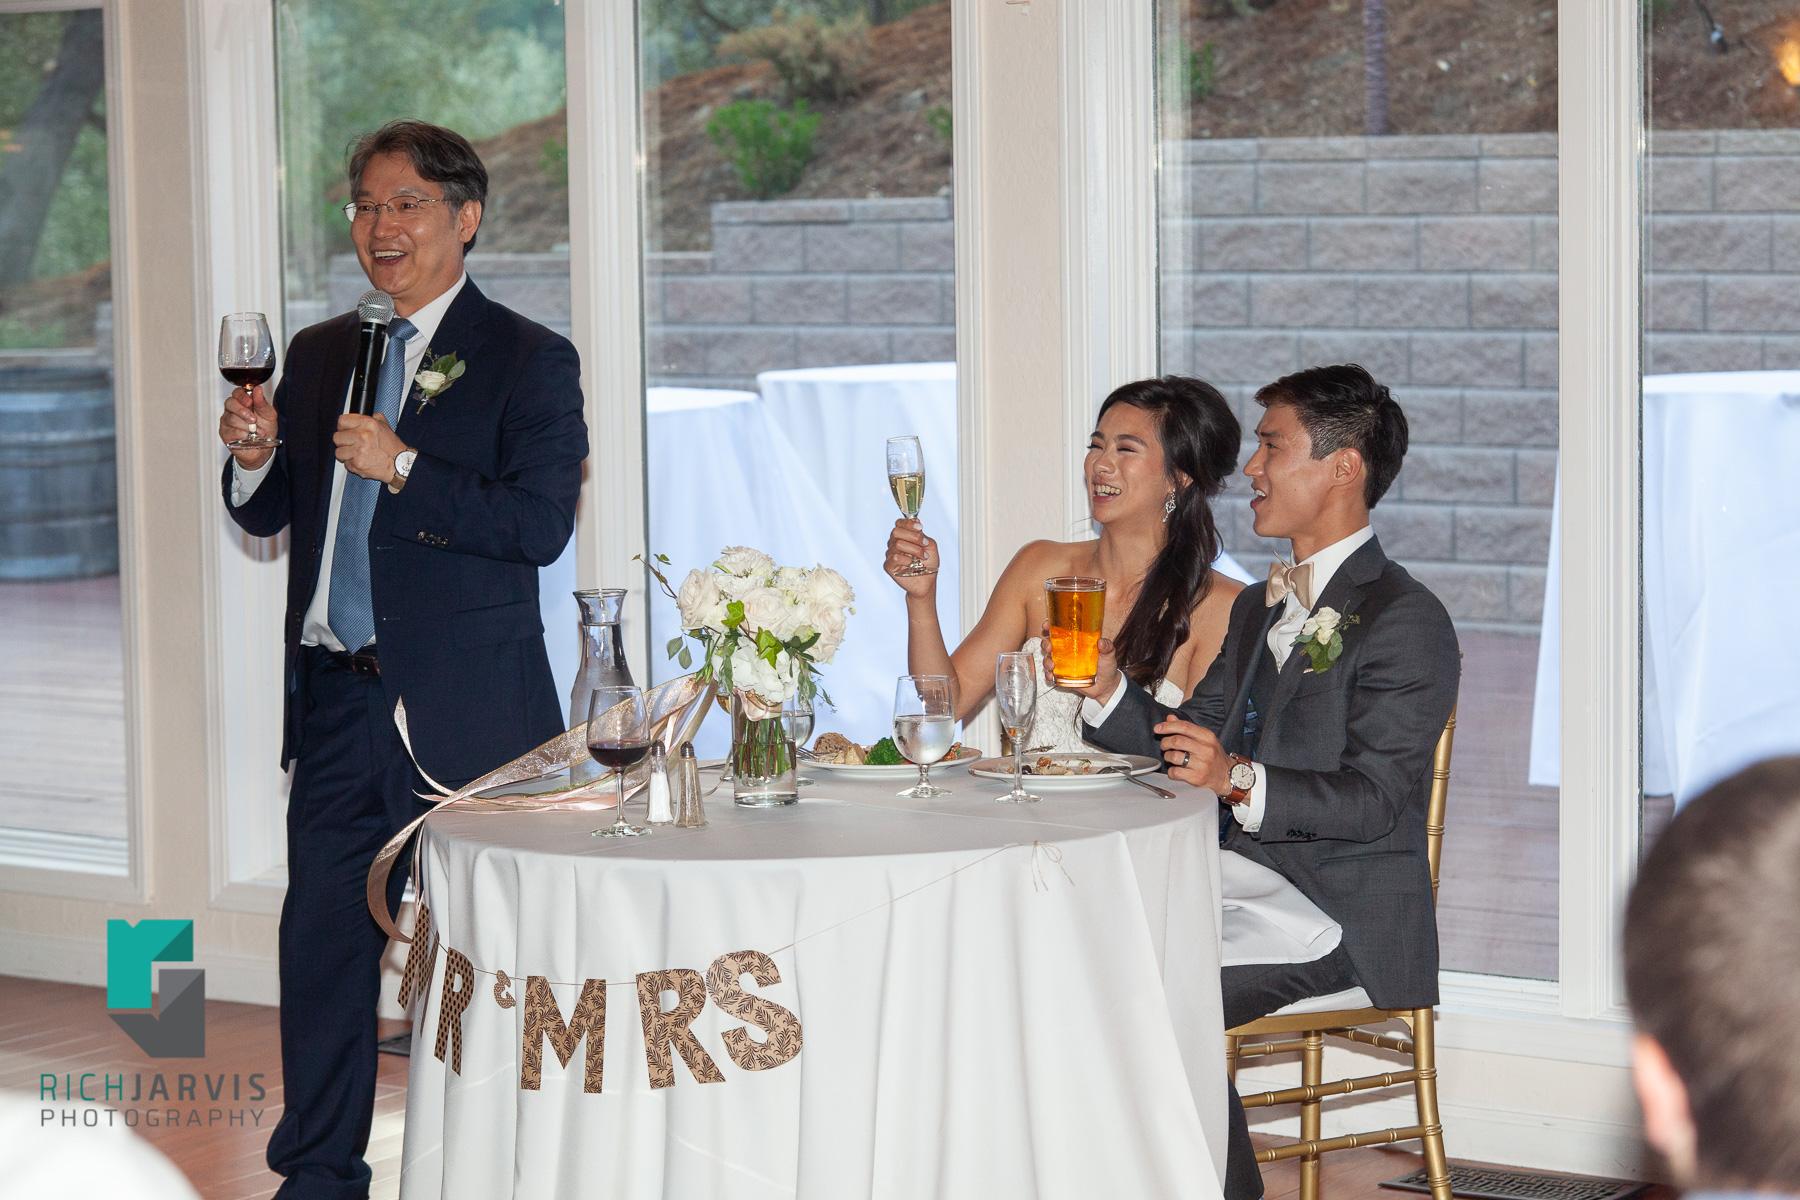 Rich Jarvis Photography Wedding32.jpg